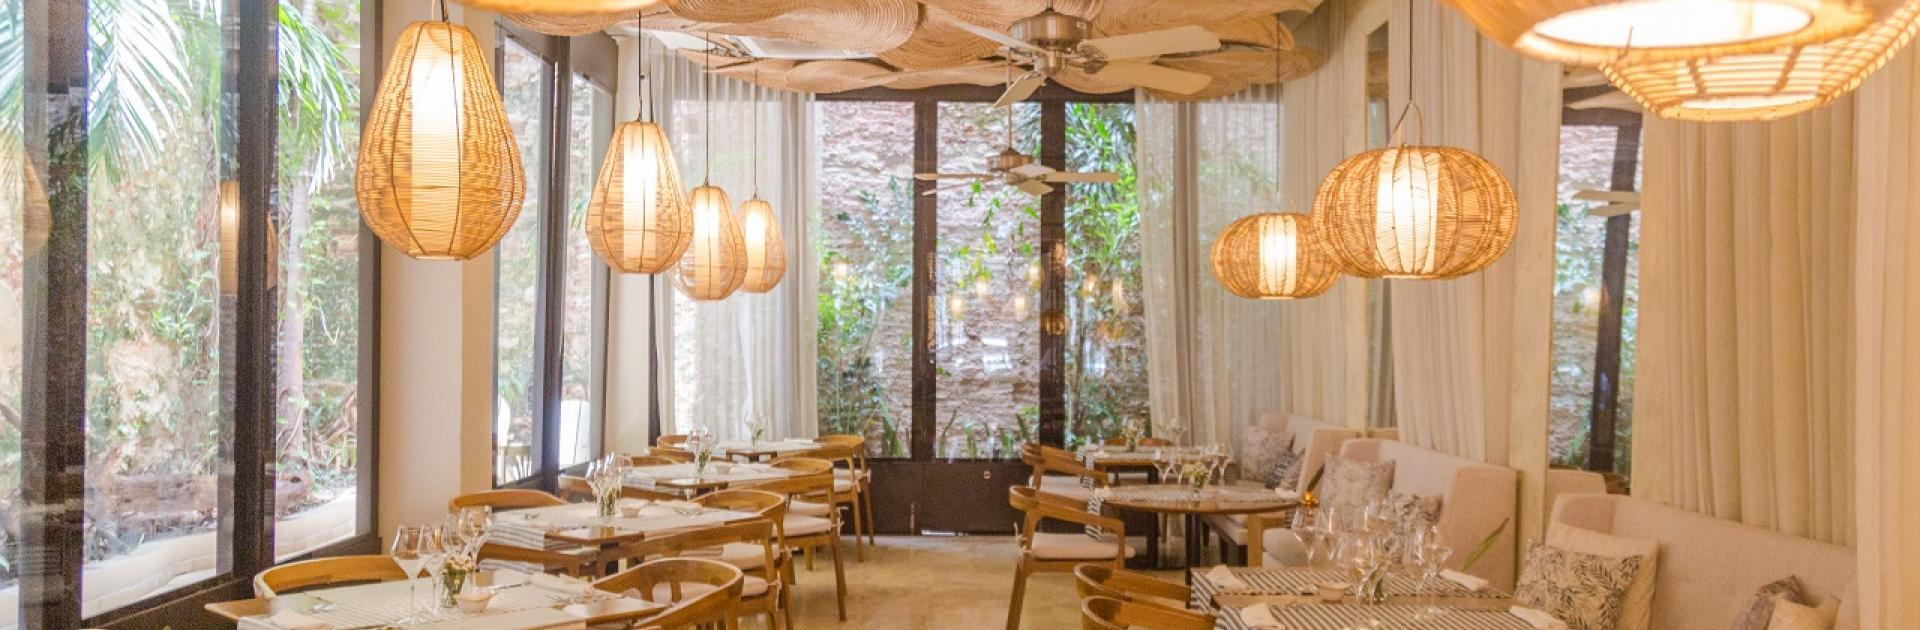 Restaurante Alyzia, participante de Dónde Restaurant Week Cartagena 2019